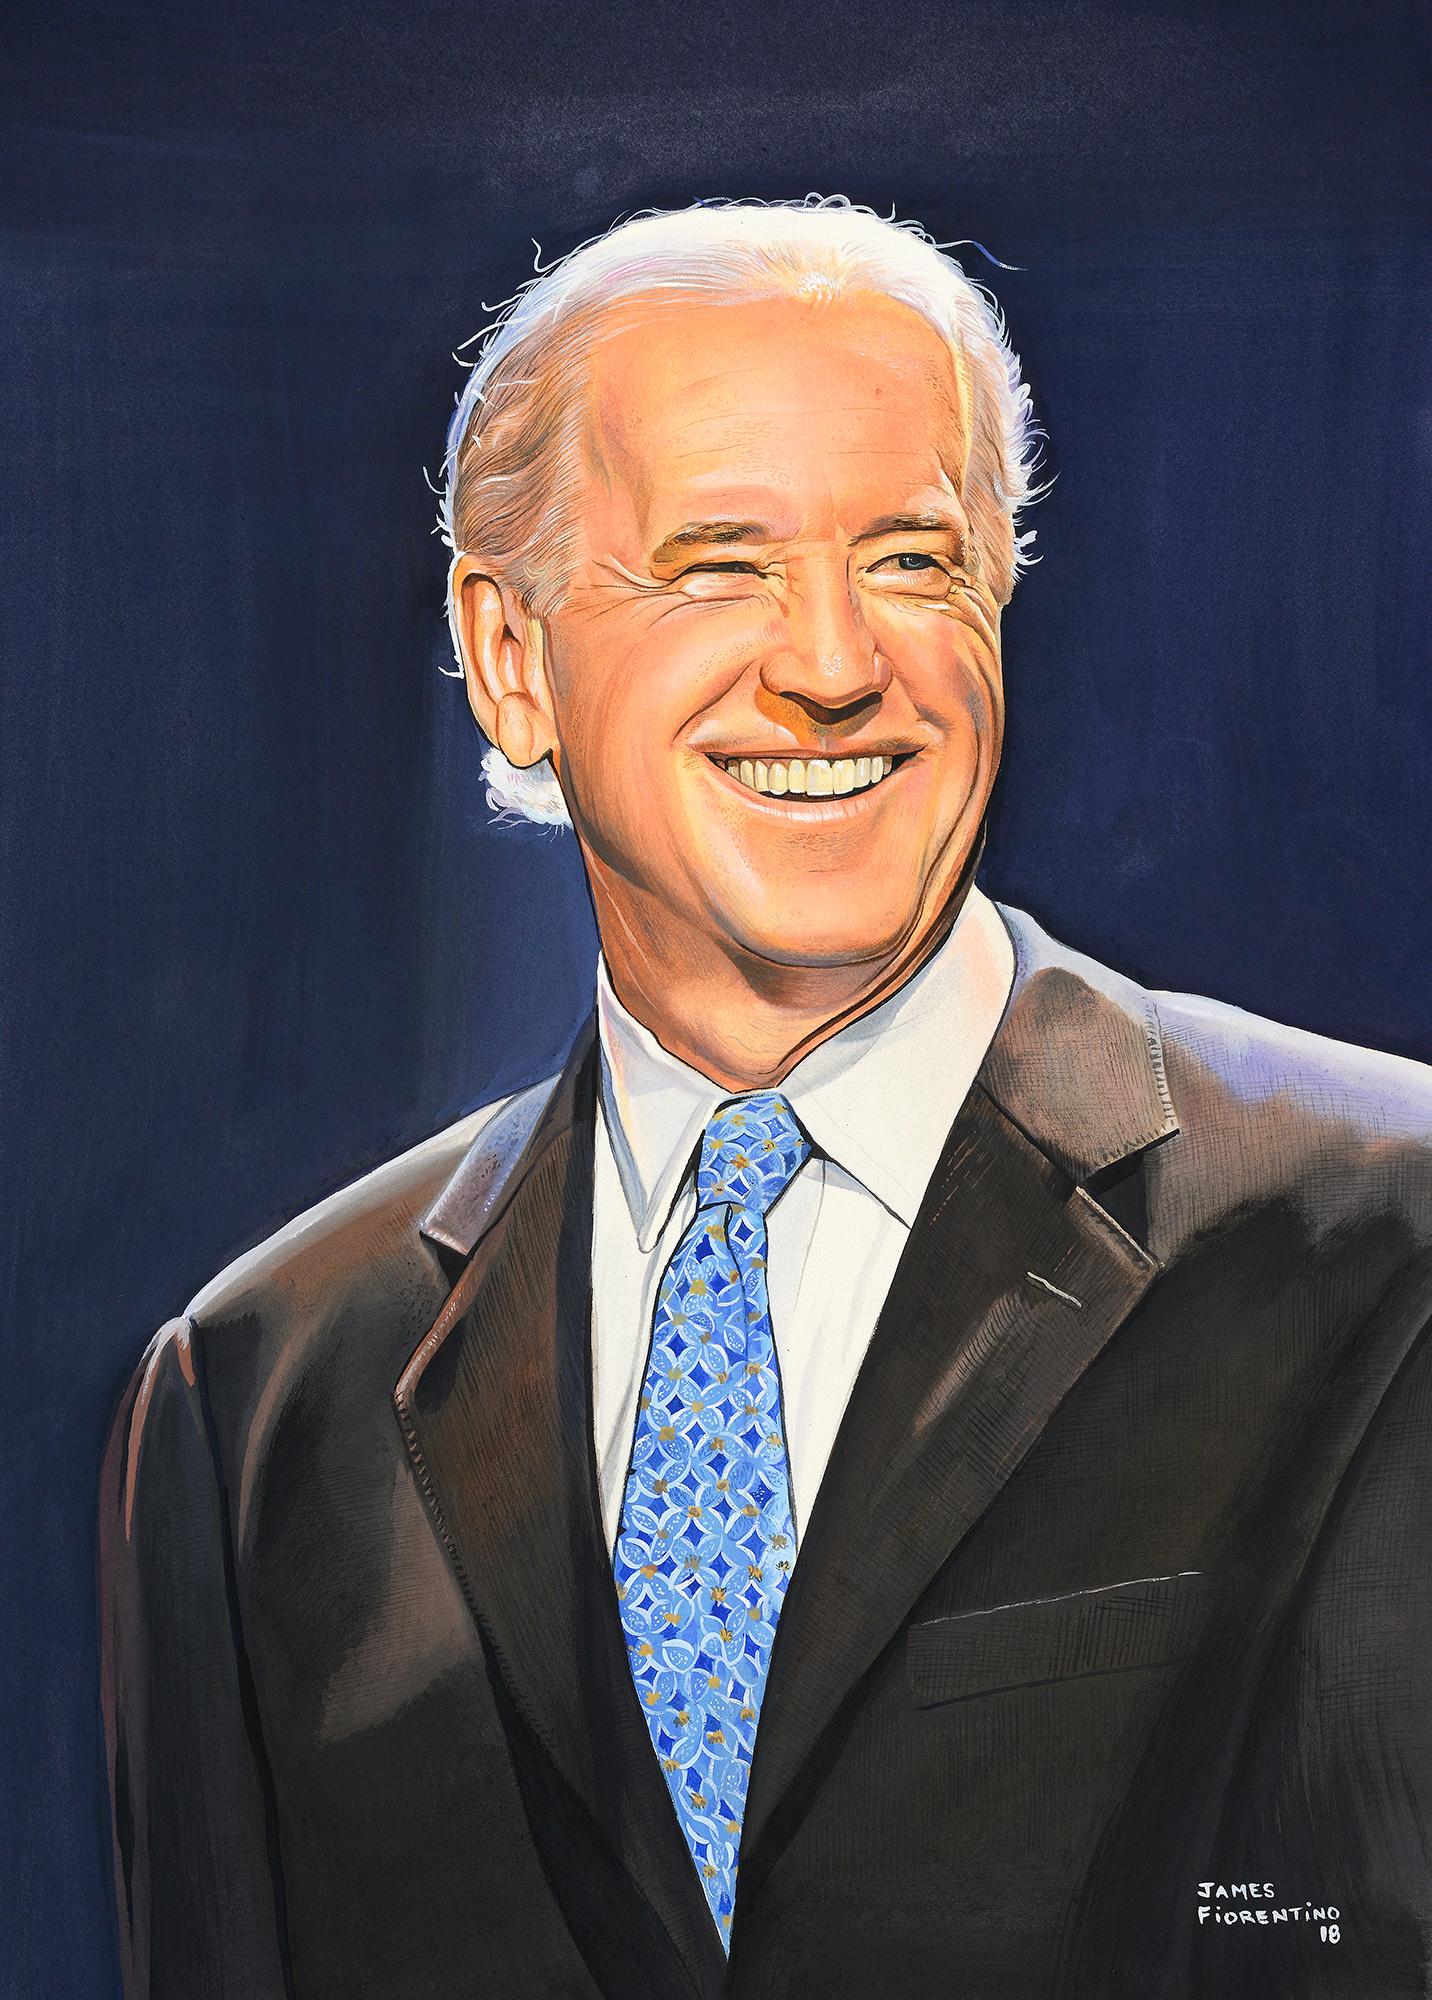 Art-collection of Joe Biden